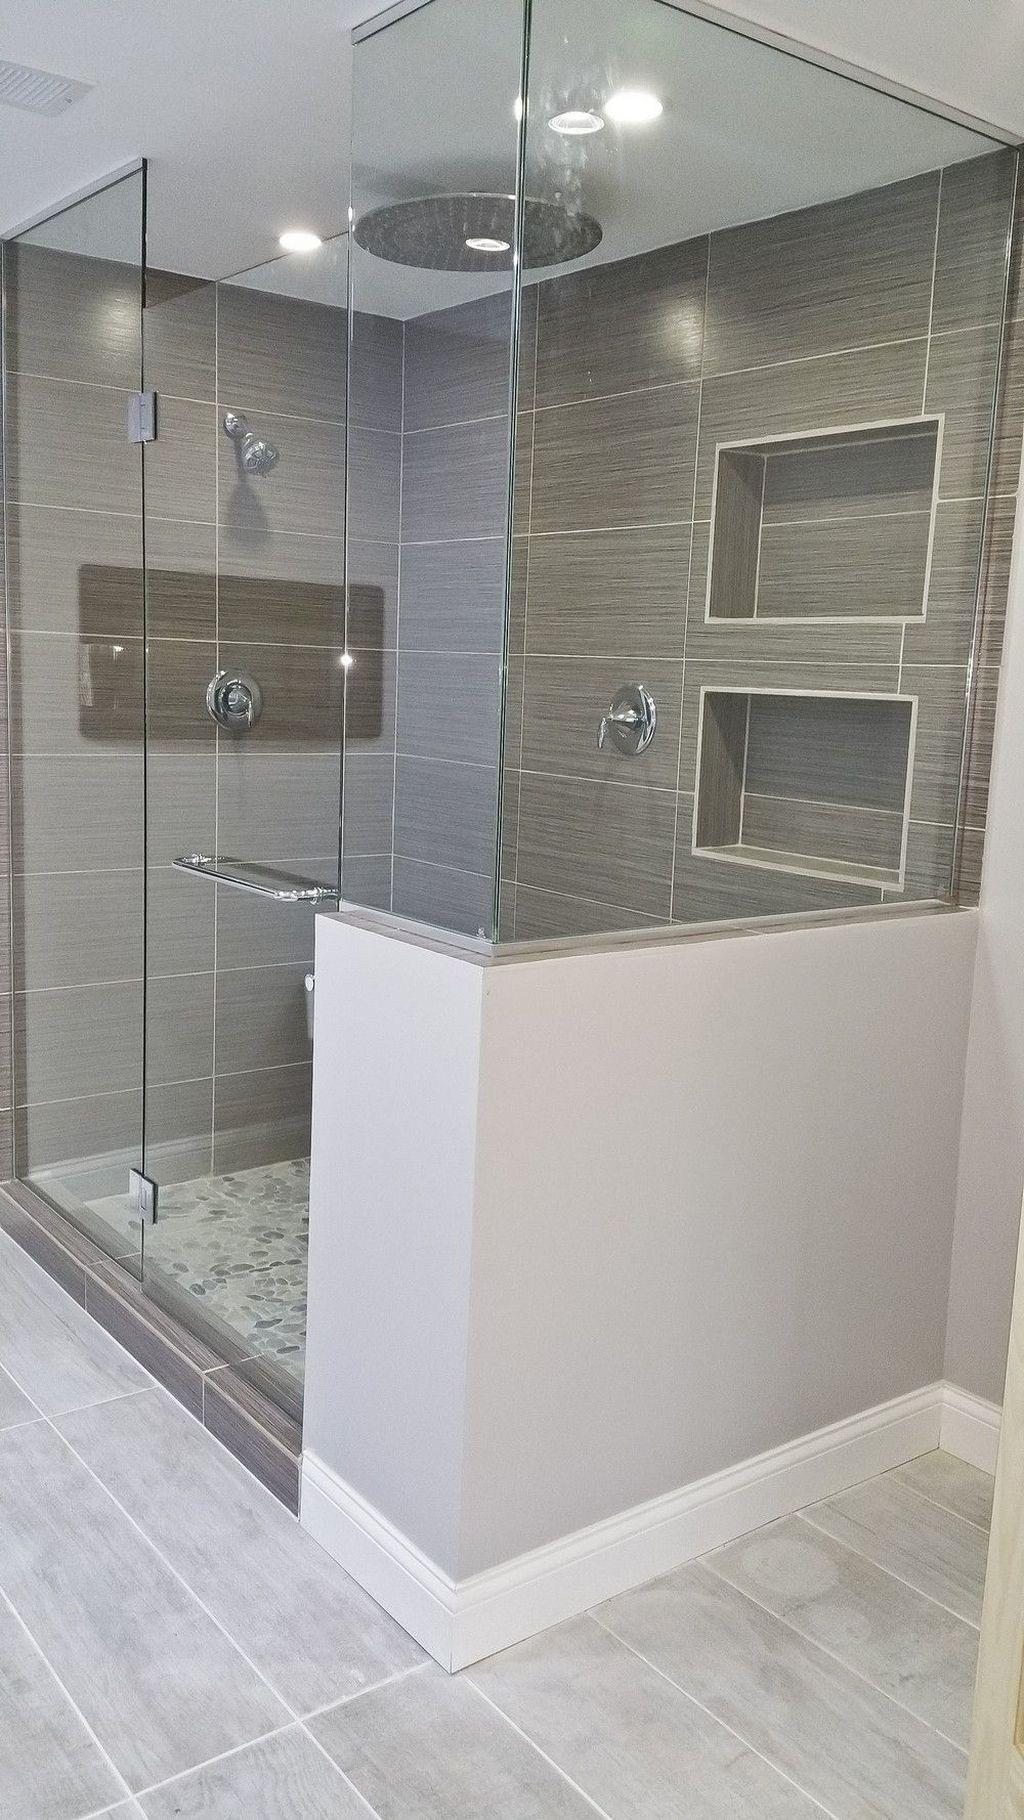 5 x 8 badezimmer design-ideen  outstanding diy bathroom makeover ideas on a budget  bathroom